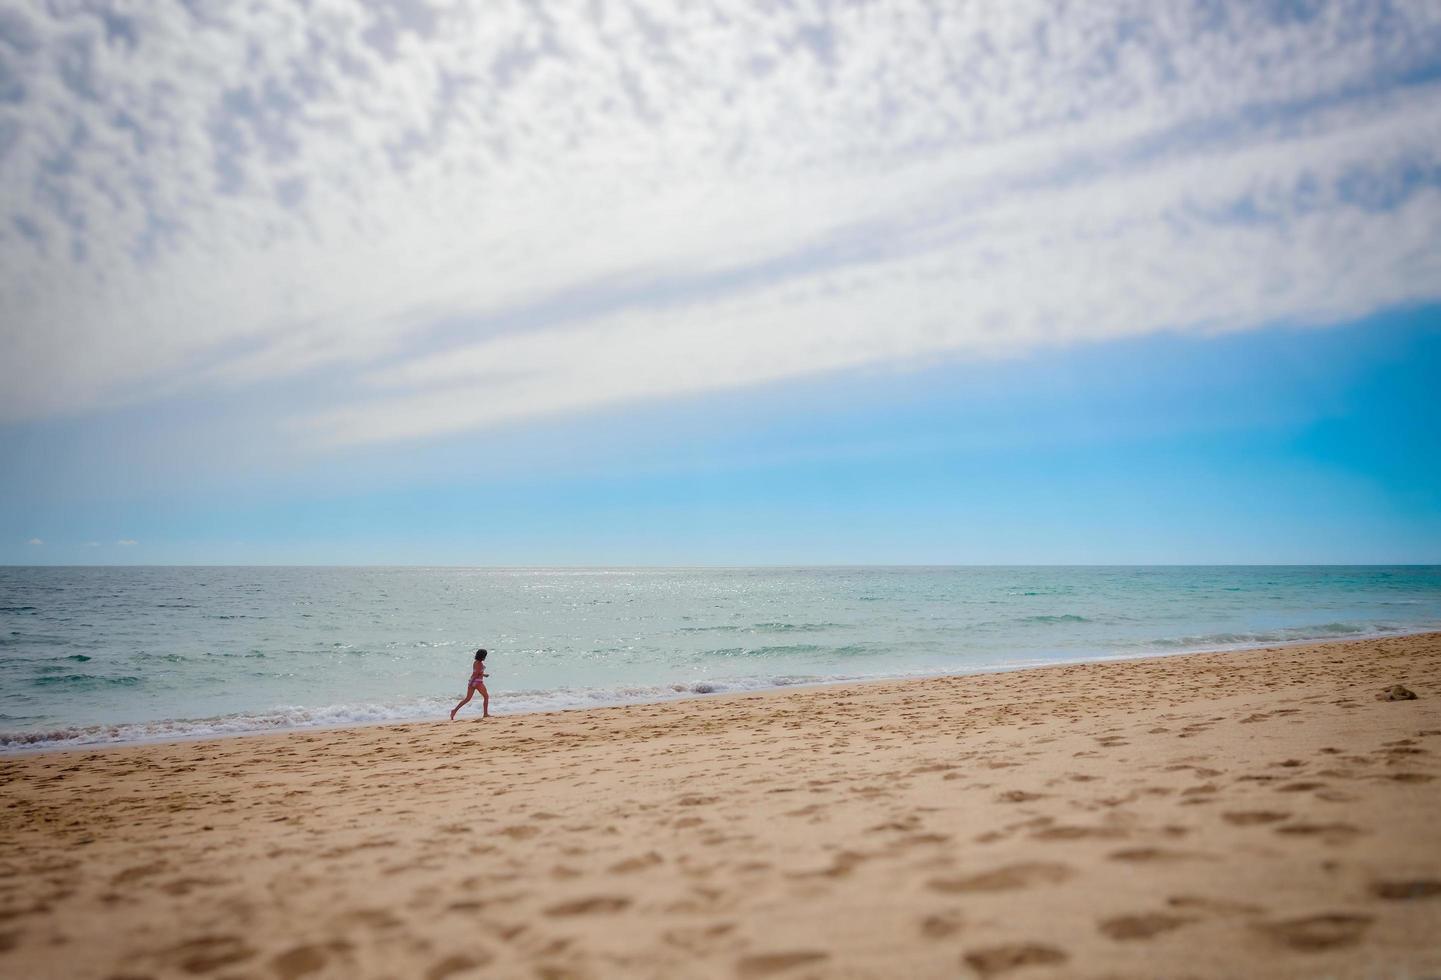 solo persoon loopt op strand foto